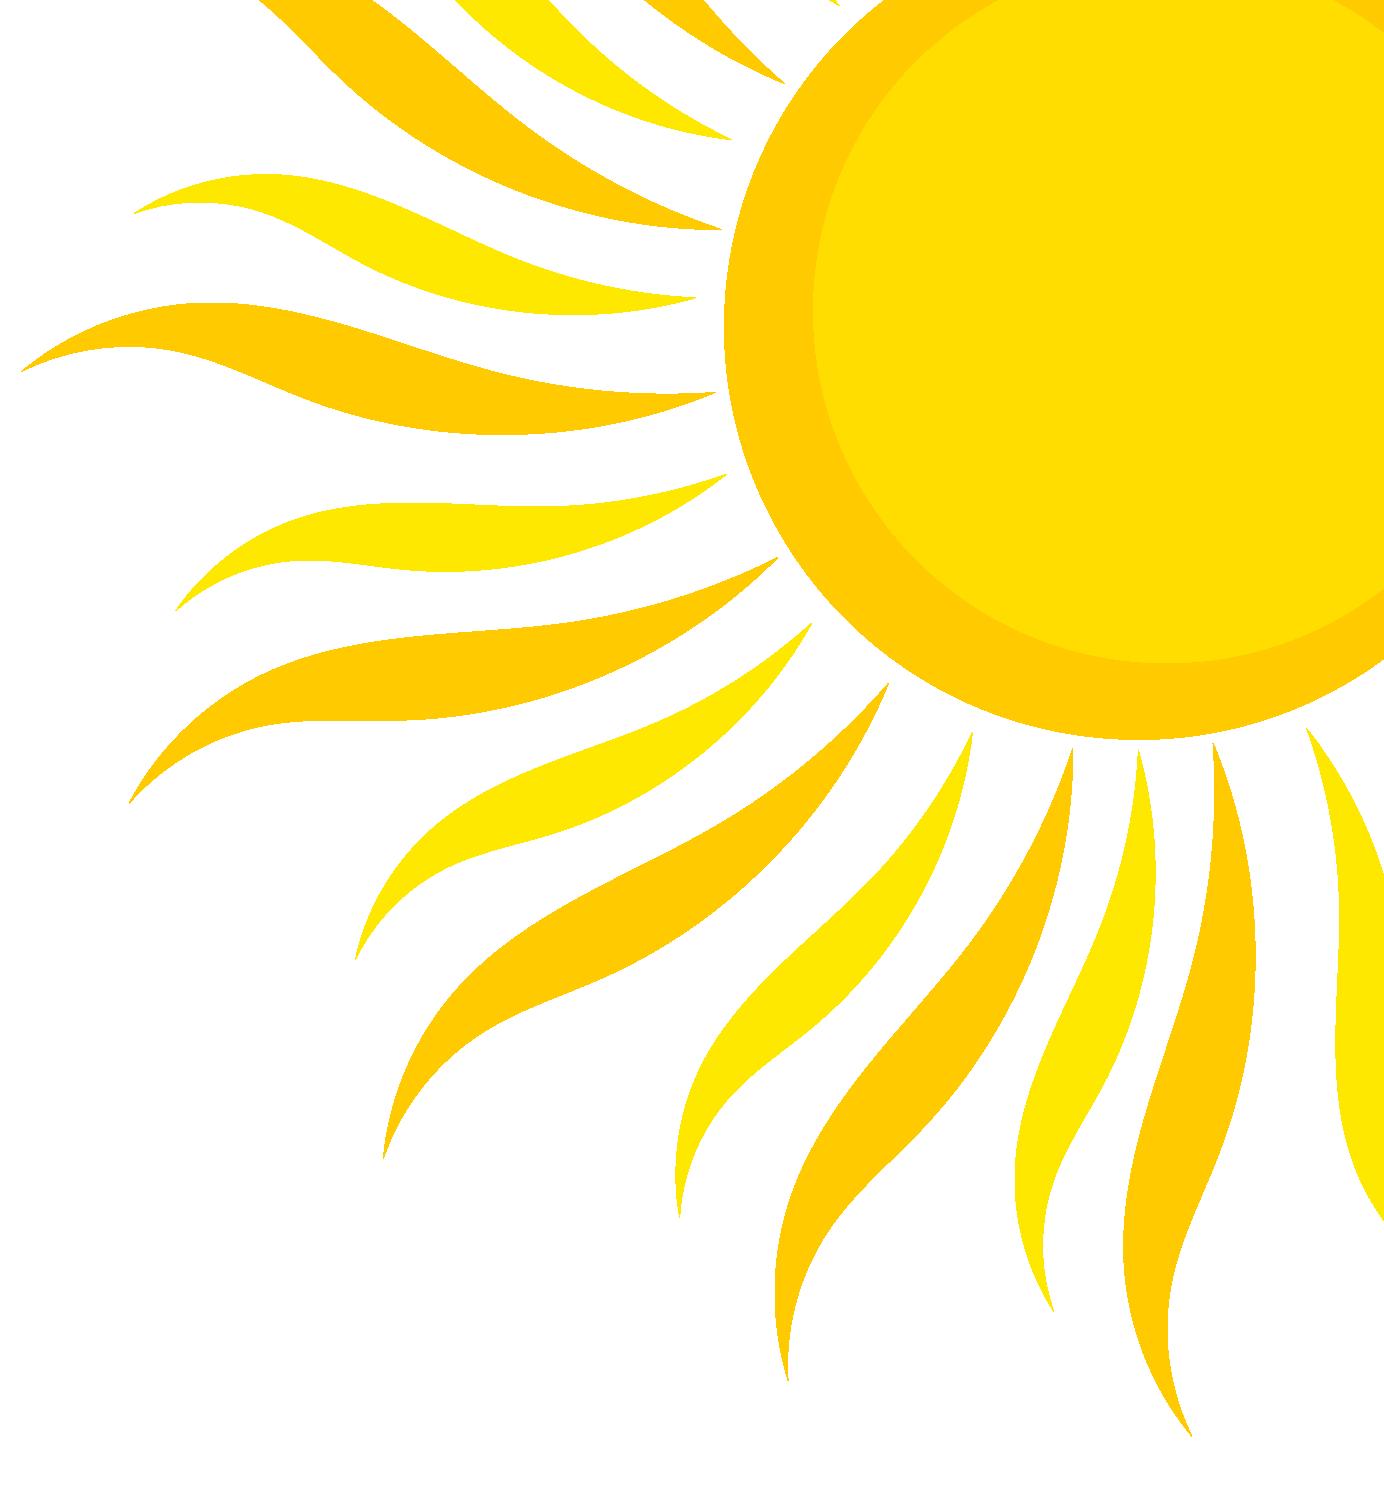 clip free library Sunshine quarter free on. Half sun clipart black and white